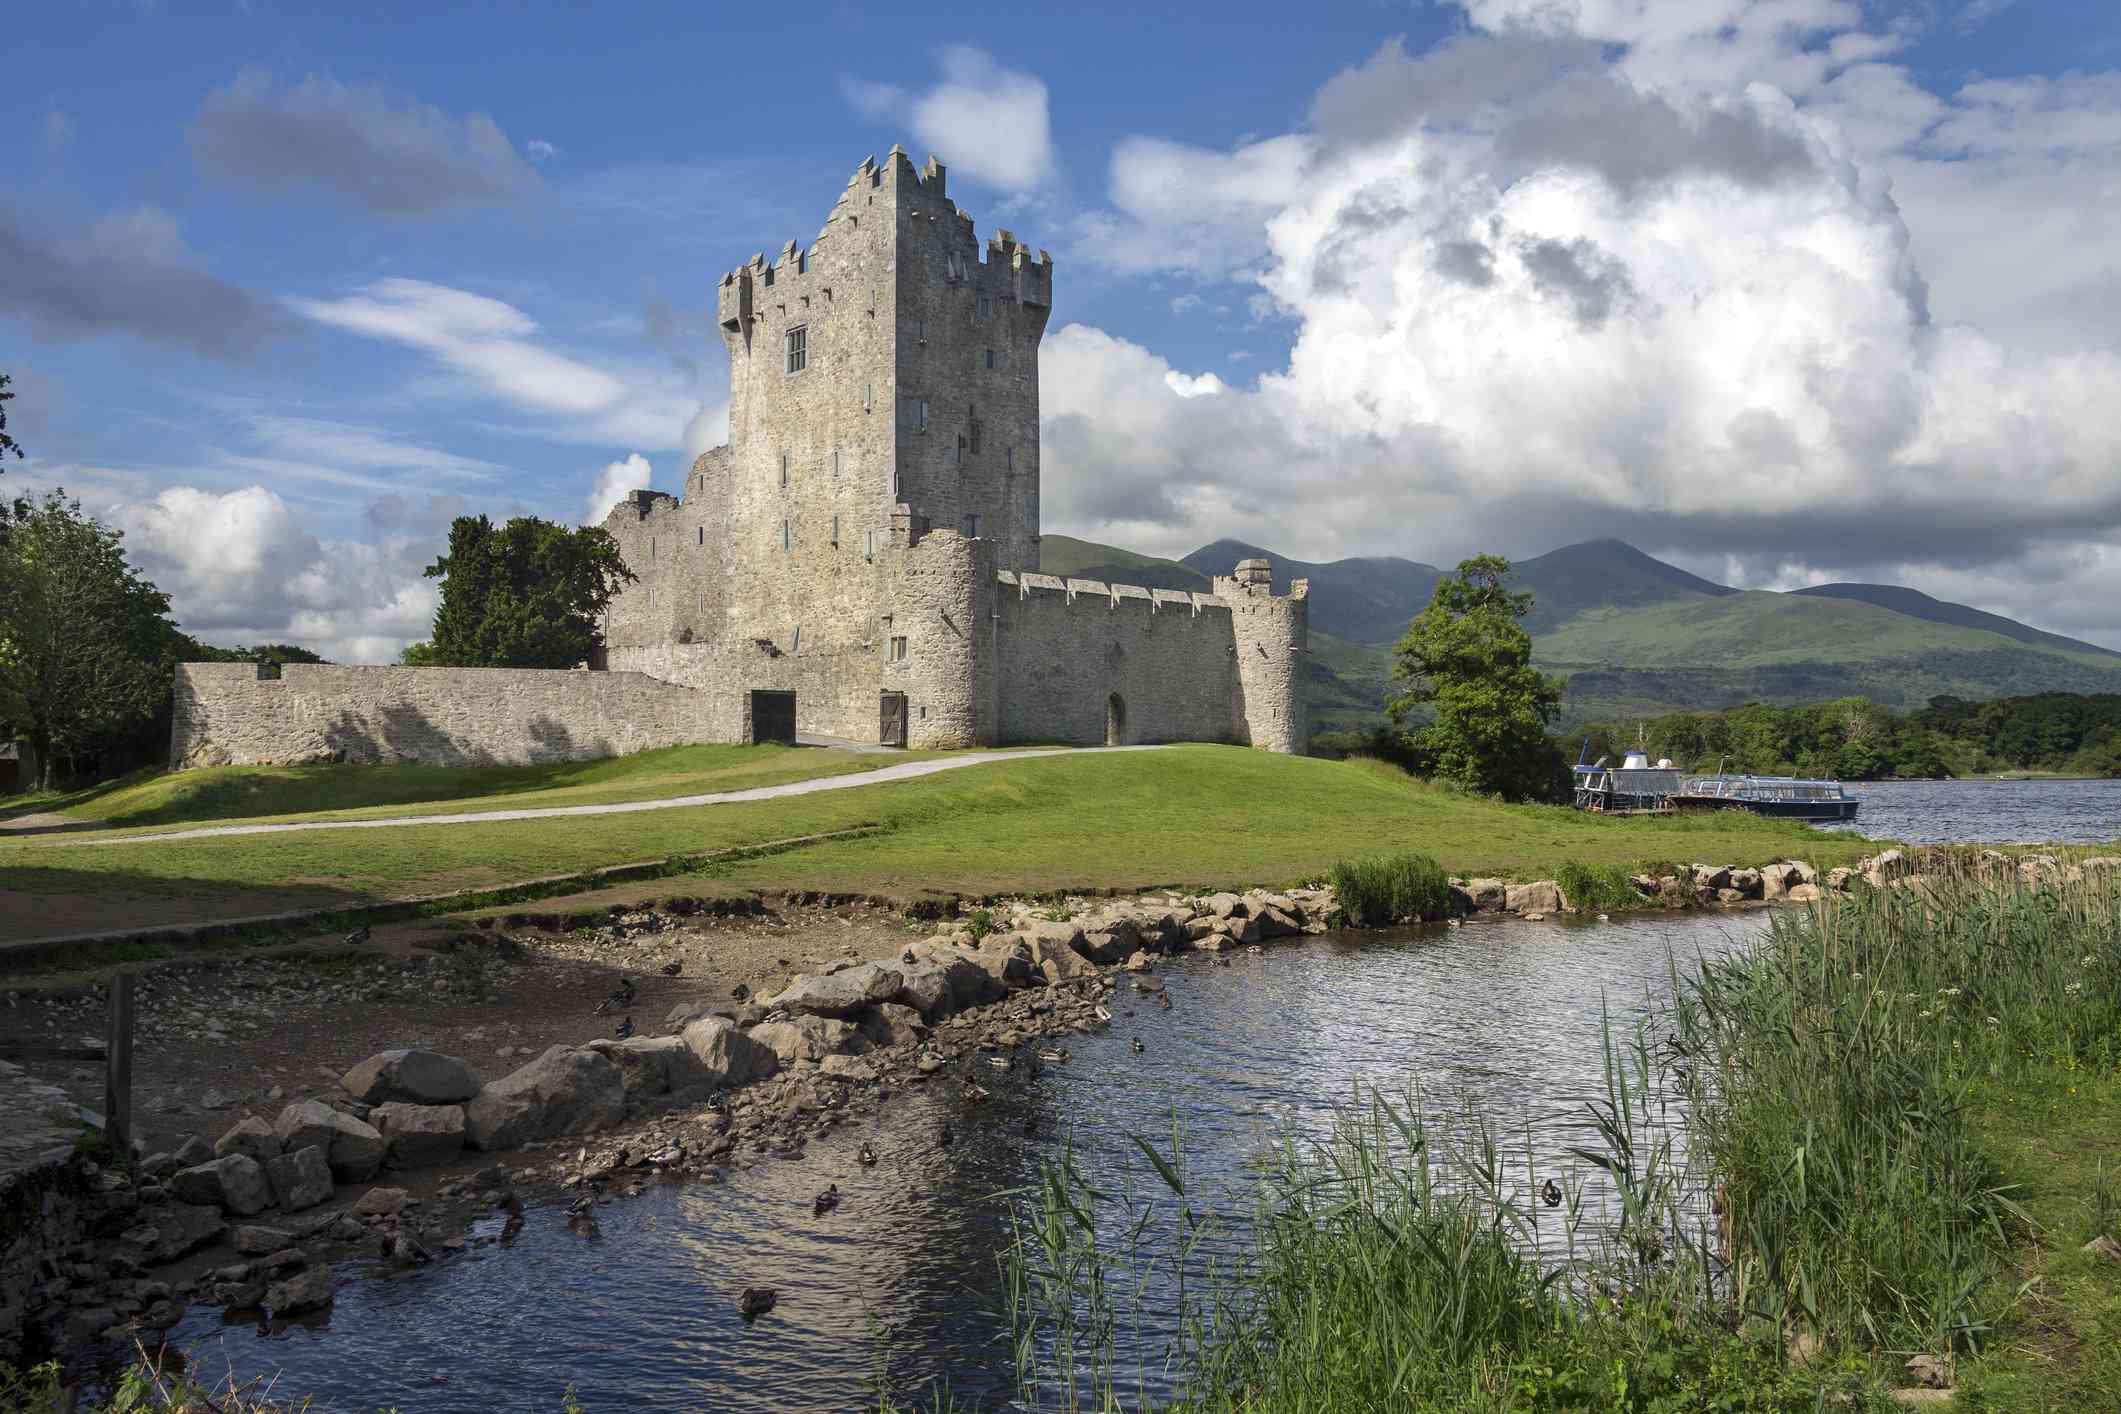 Ross Castle - Killarney - Republic of Ireland